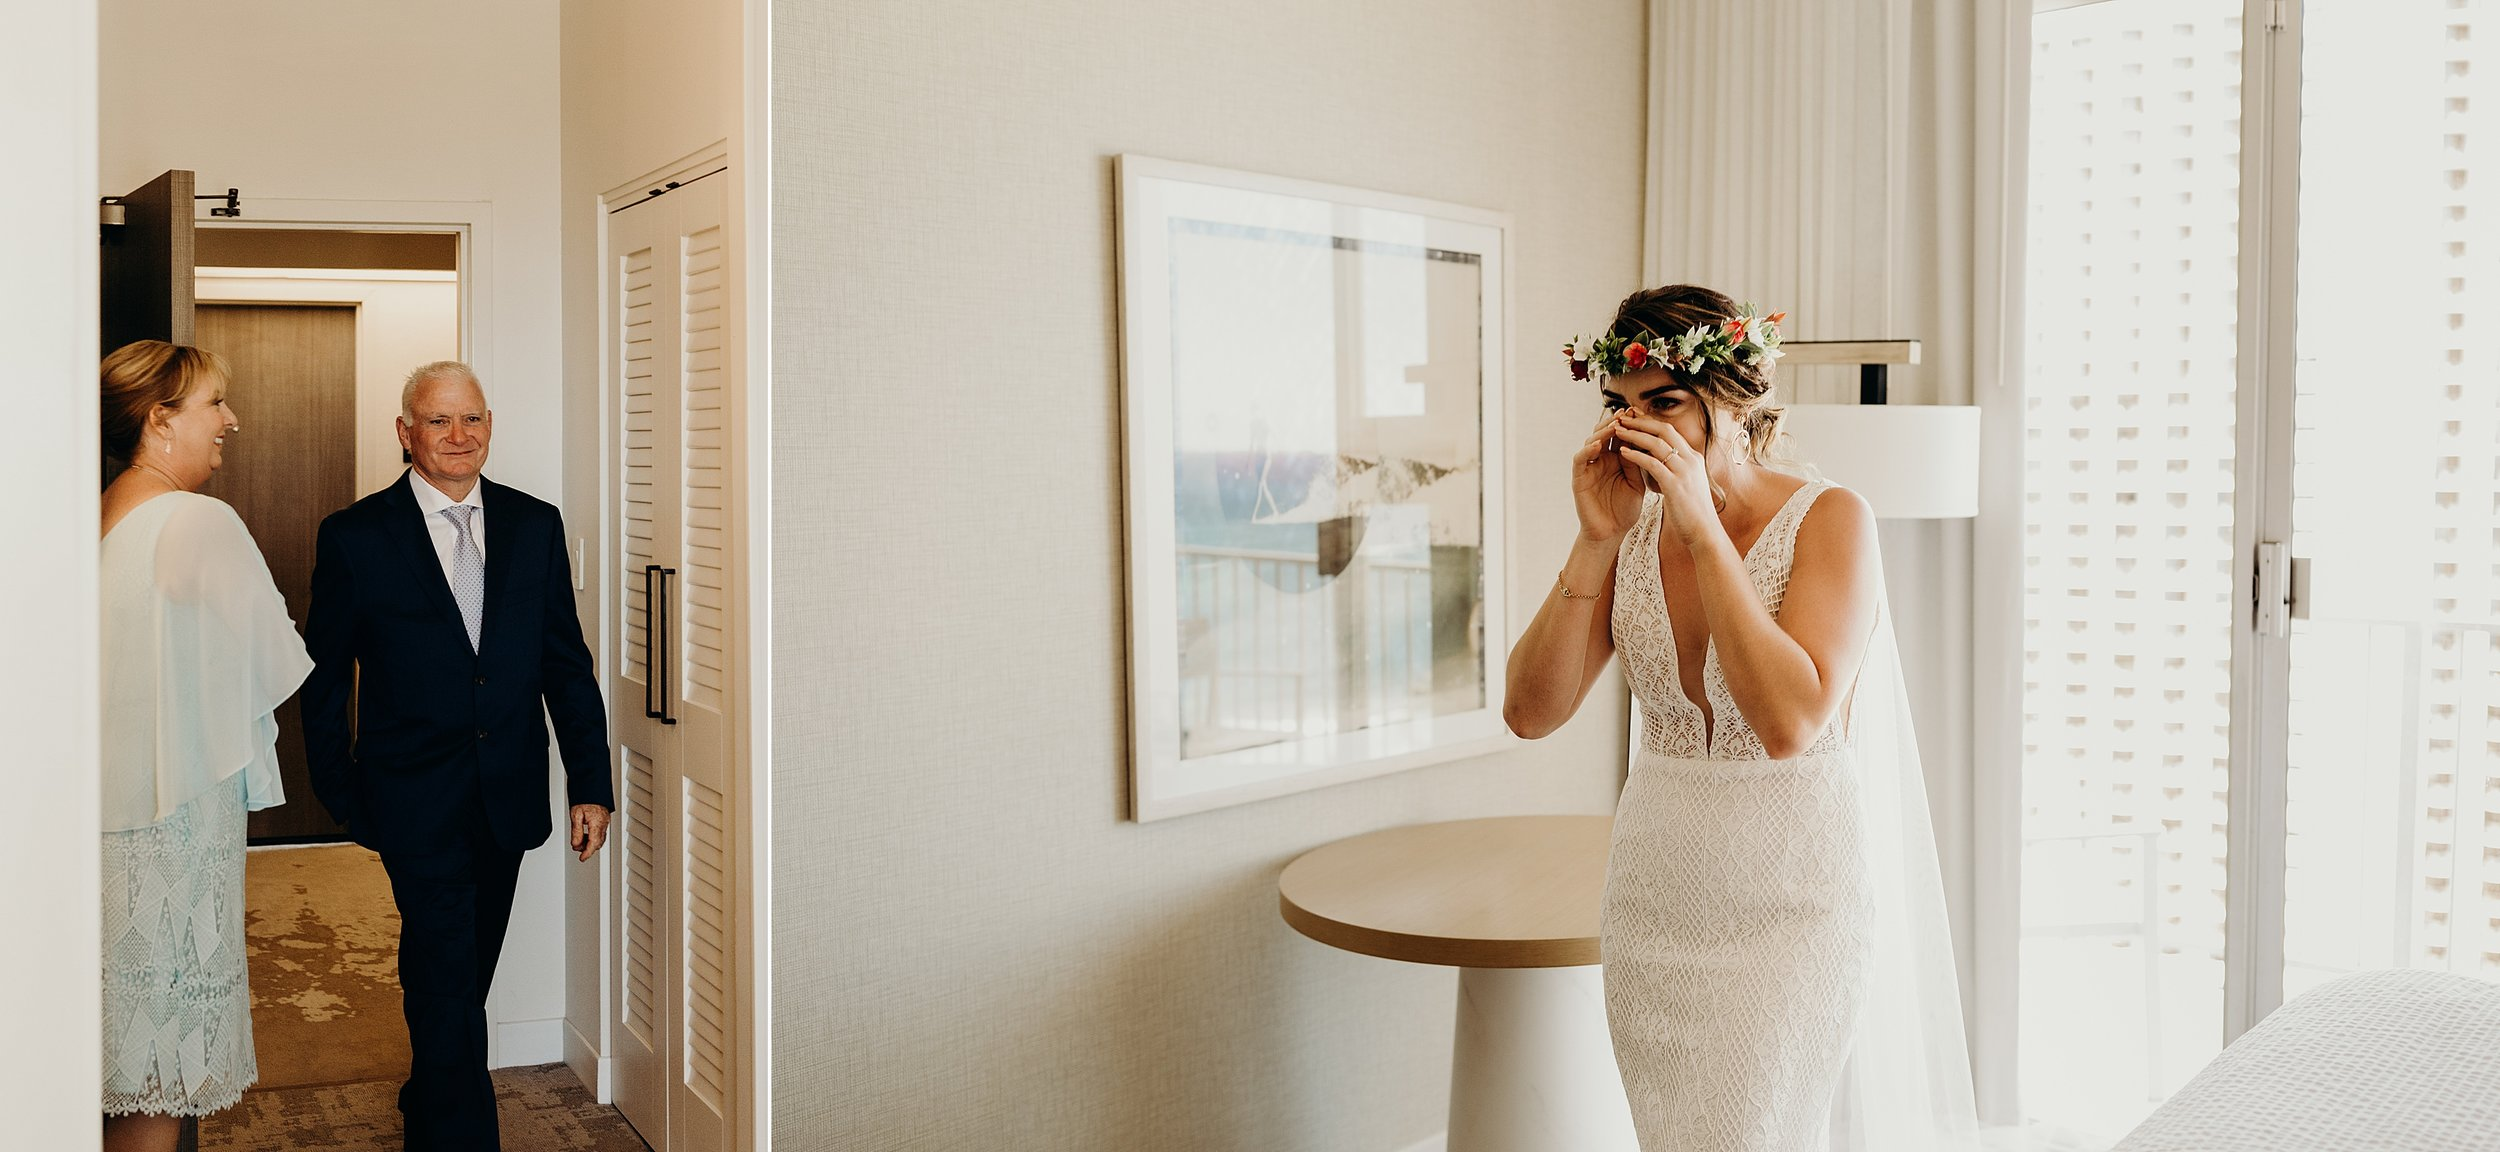 HAWAII-WEDDING-PHOTOGRAPHER-ALOHILANI-RESORT-KEANI-BAKULA_0003.jpg